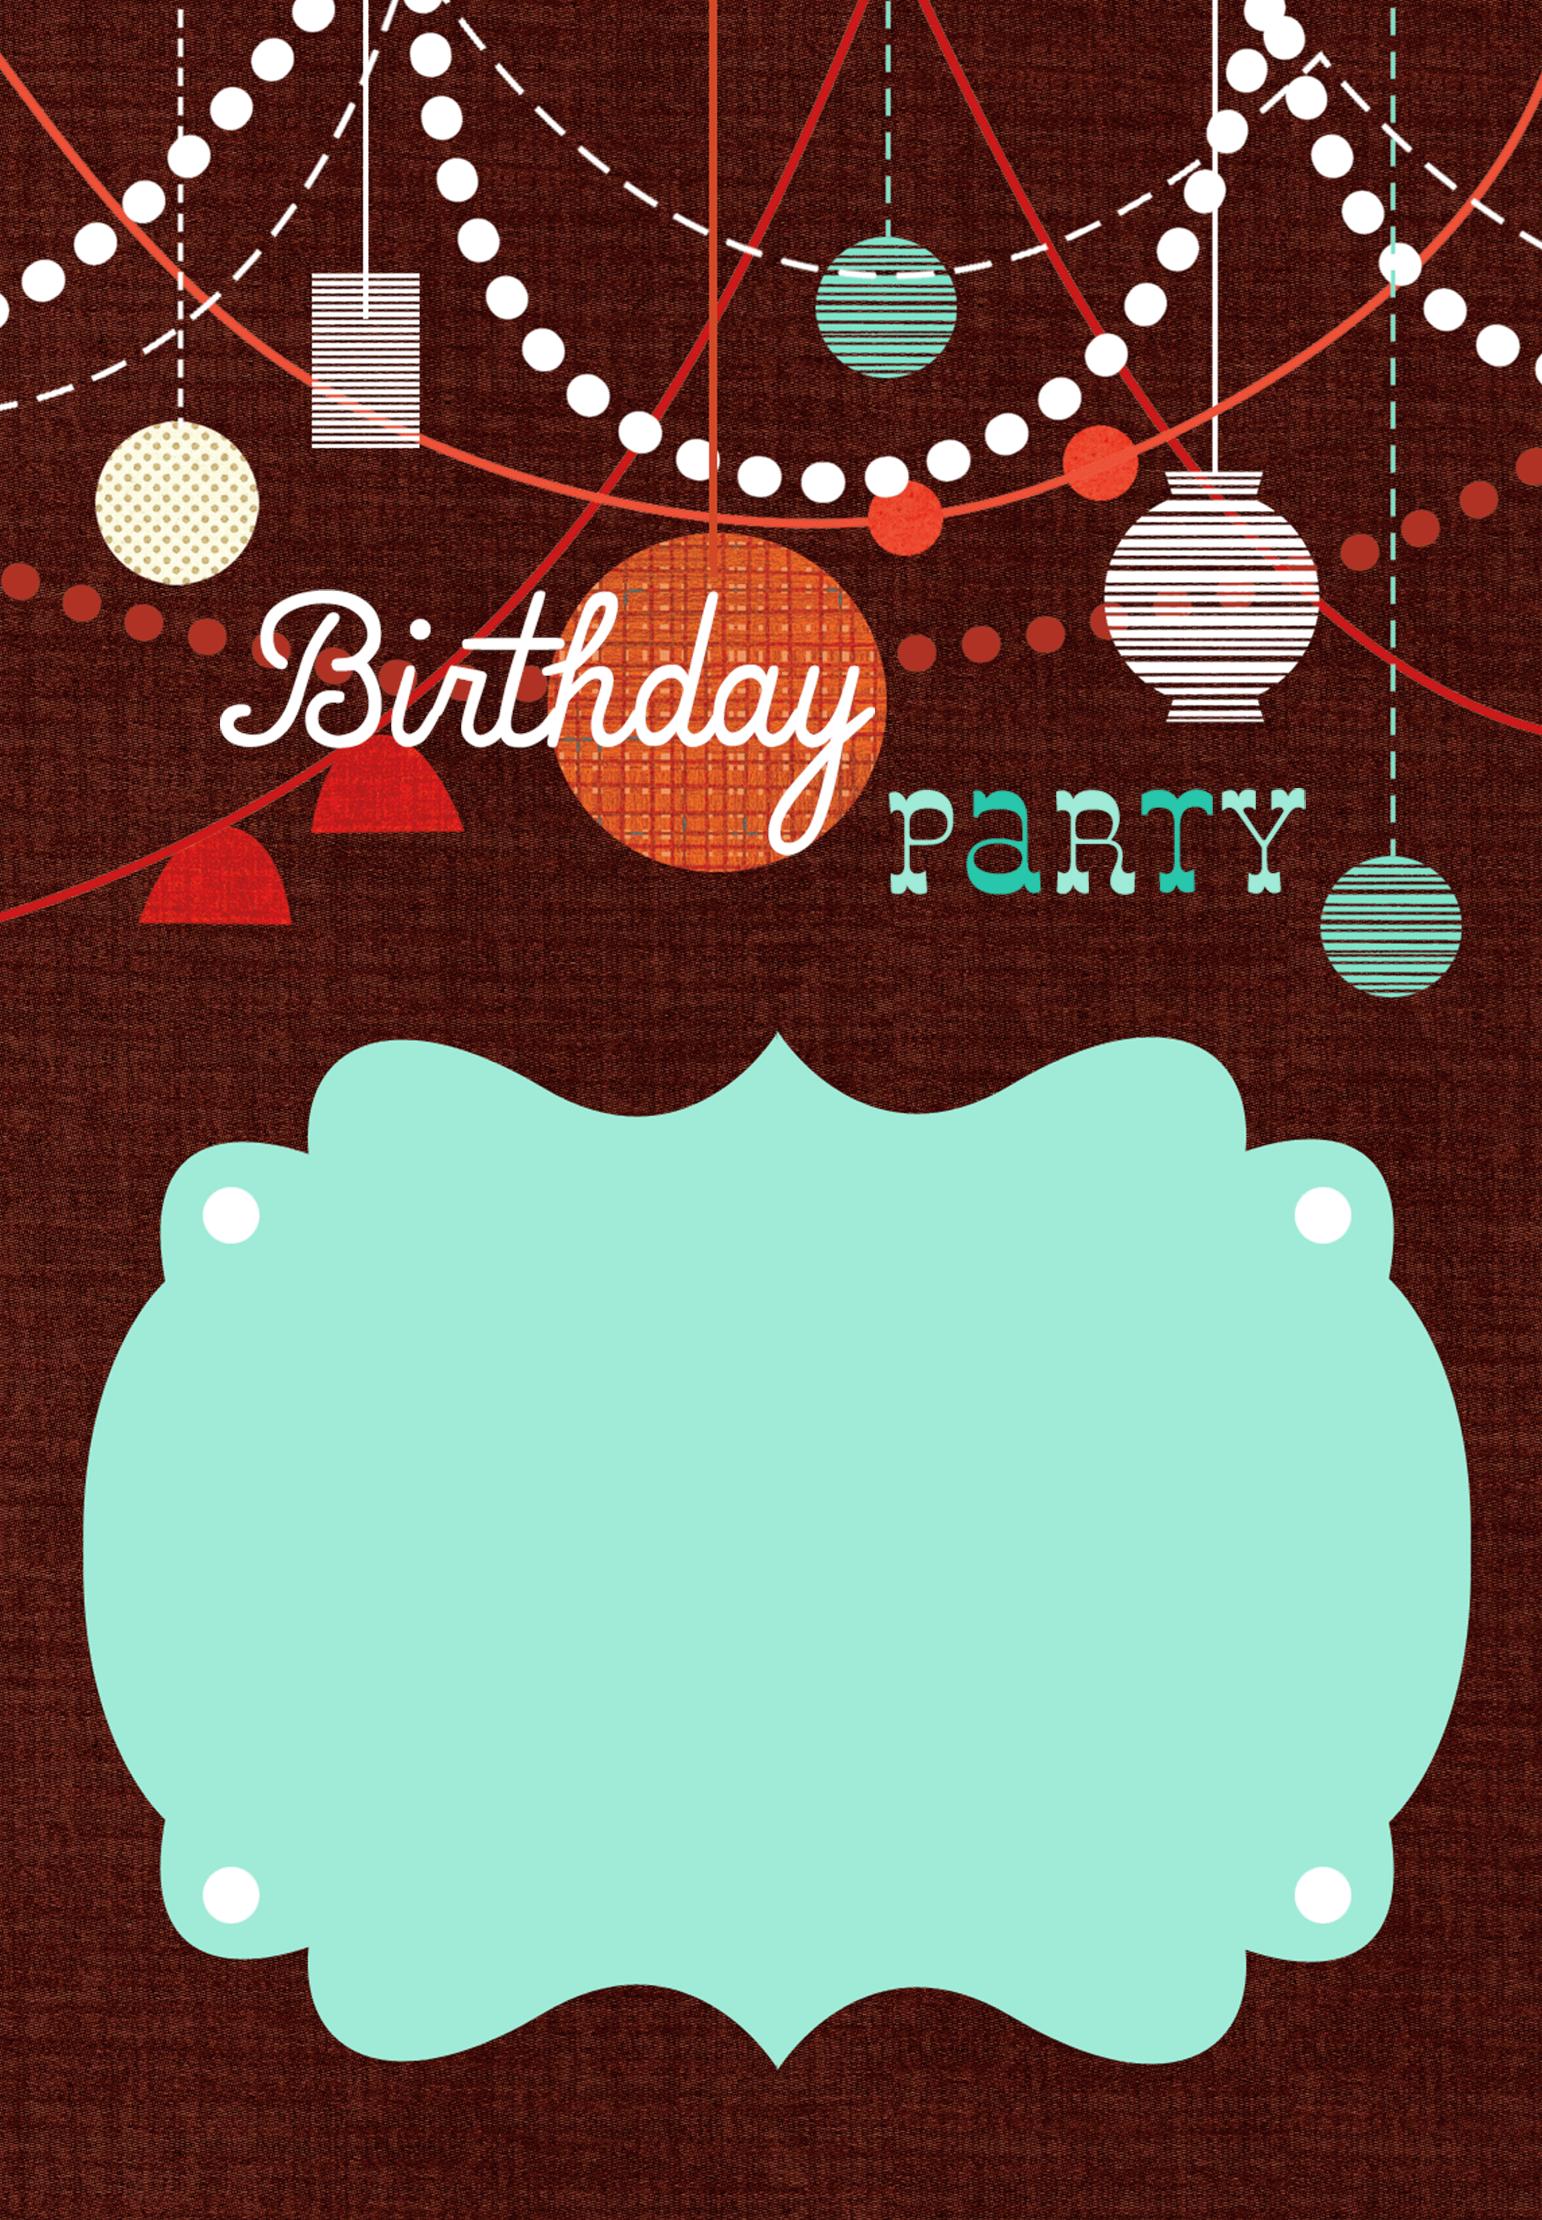 Birthday Decorations Free Birthday Invitation Template Greetings Isl Printable Birthday Invitations Birthday Invitation Card Template Party Invite Template